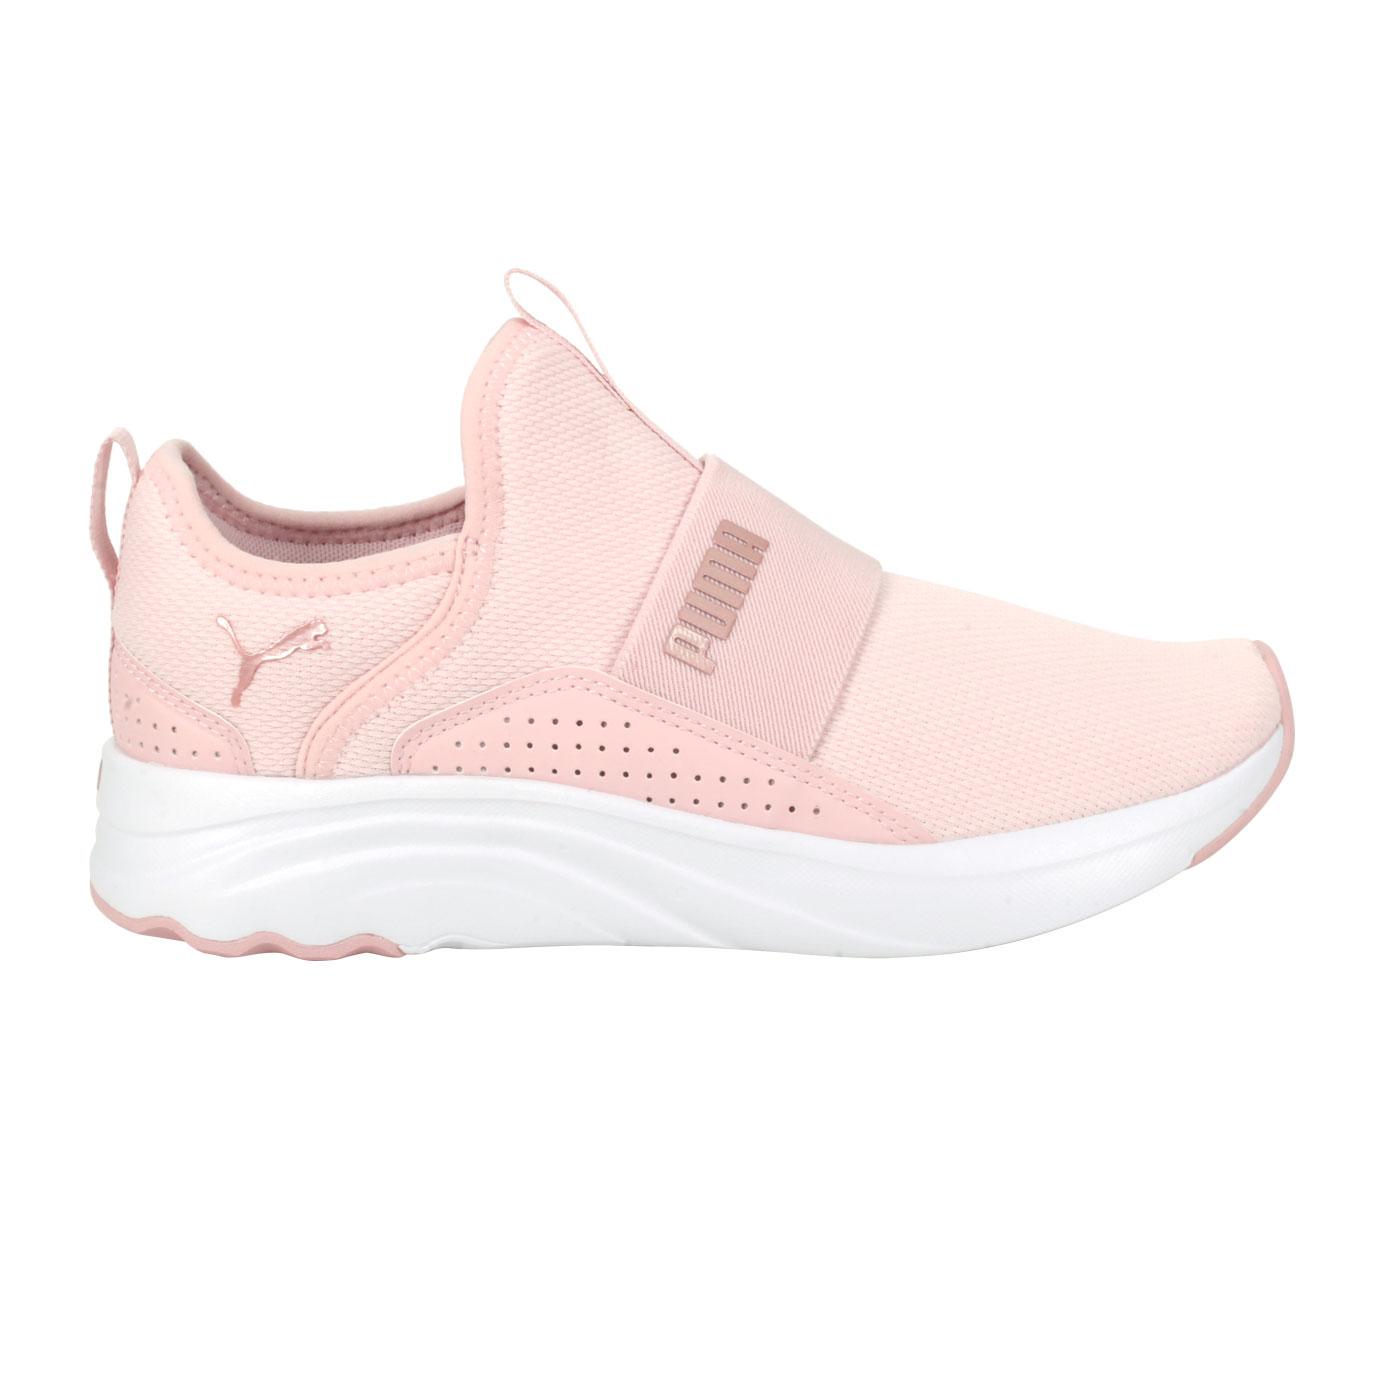 PUMA 女款休閒運動鞋  @Softride Sophia Slip-On Wn's@19516103 - 粉橘玫瑰金